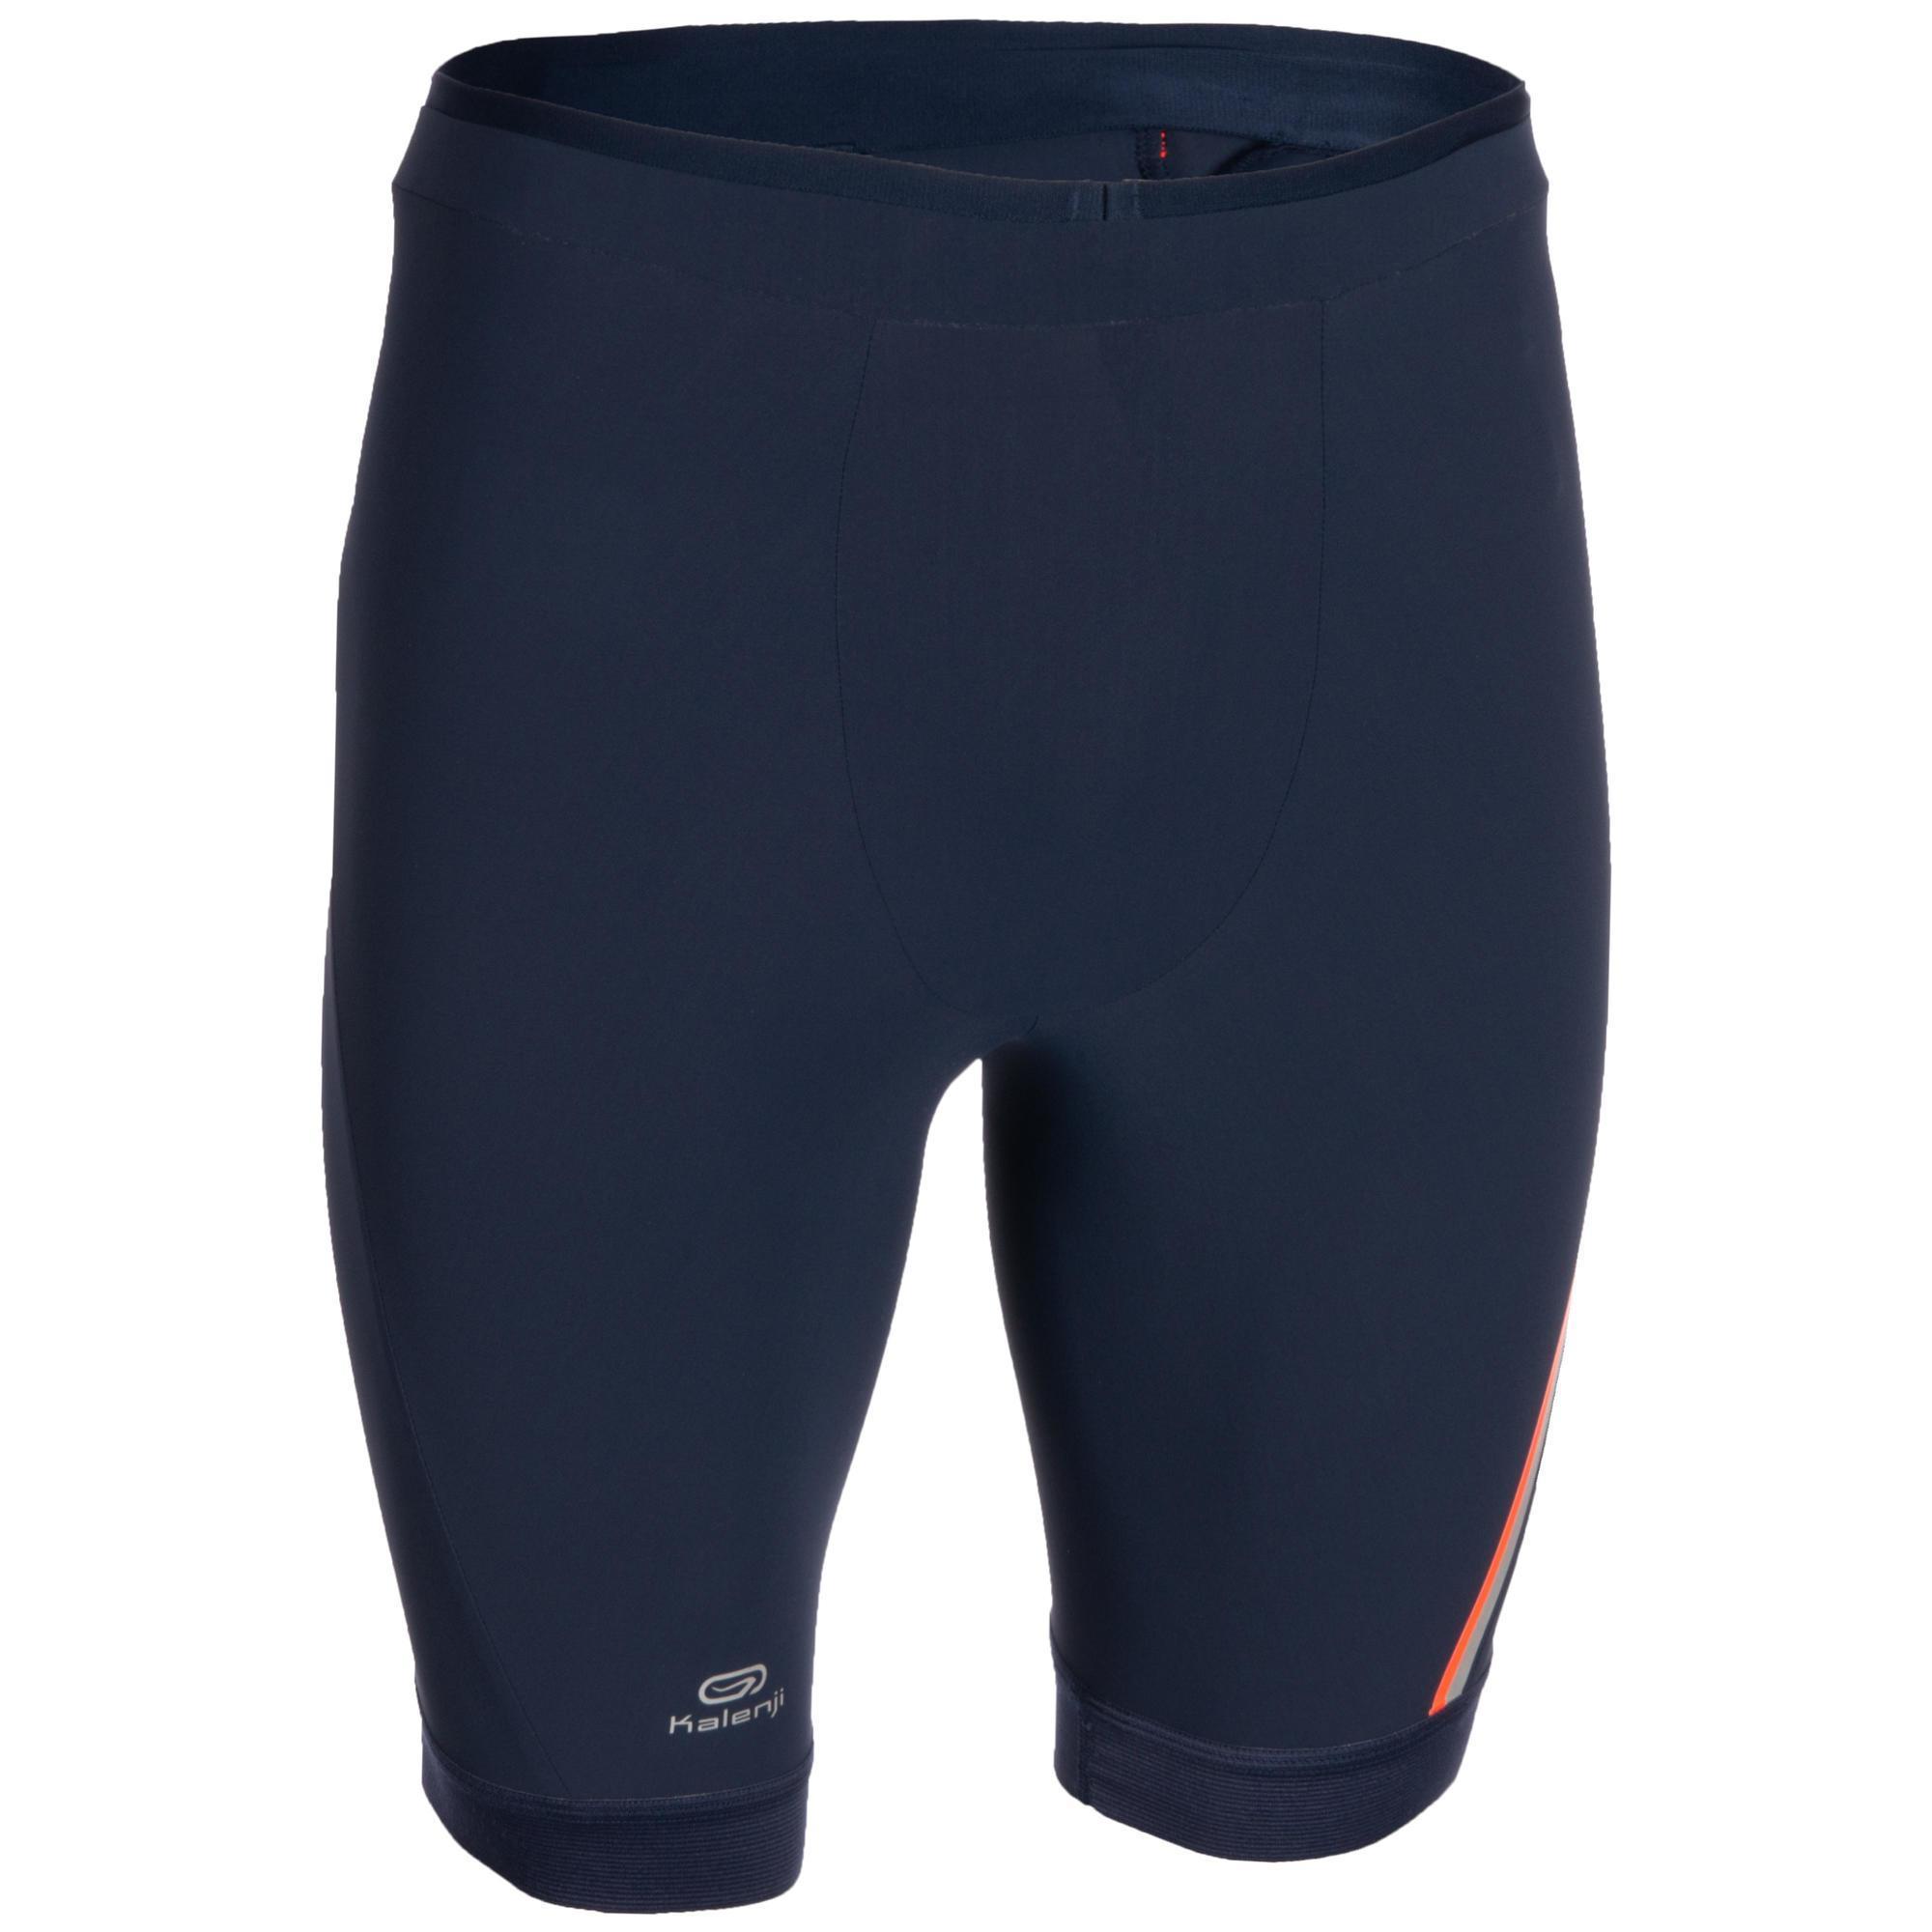 Kalenji Korte atletiekbroek Kiprun heren blauw/rood